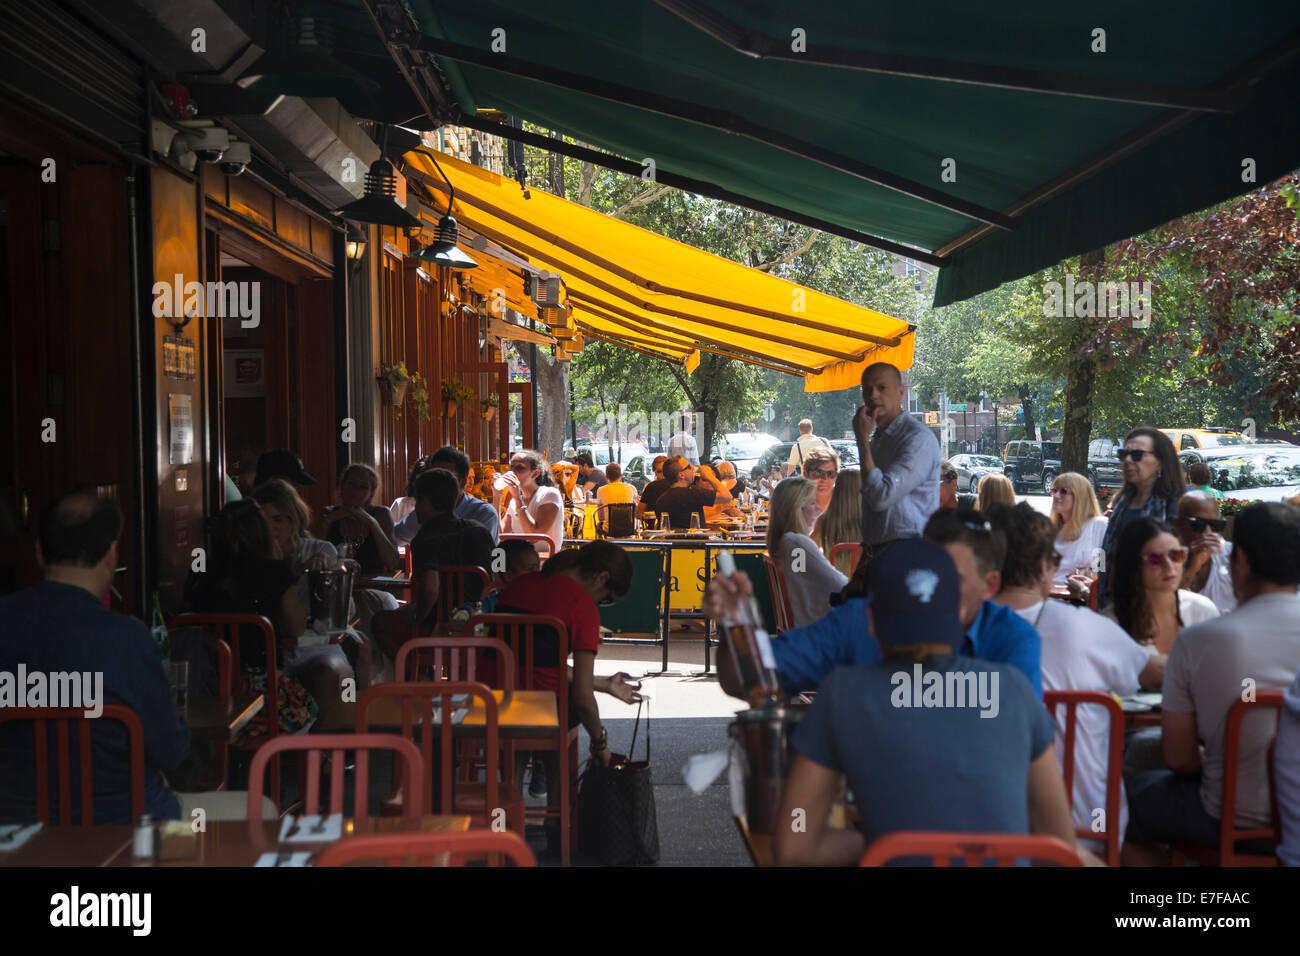 Restaurant al fresco brunch du dimanche Photo Stock